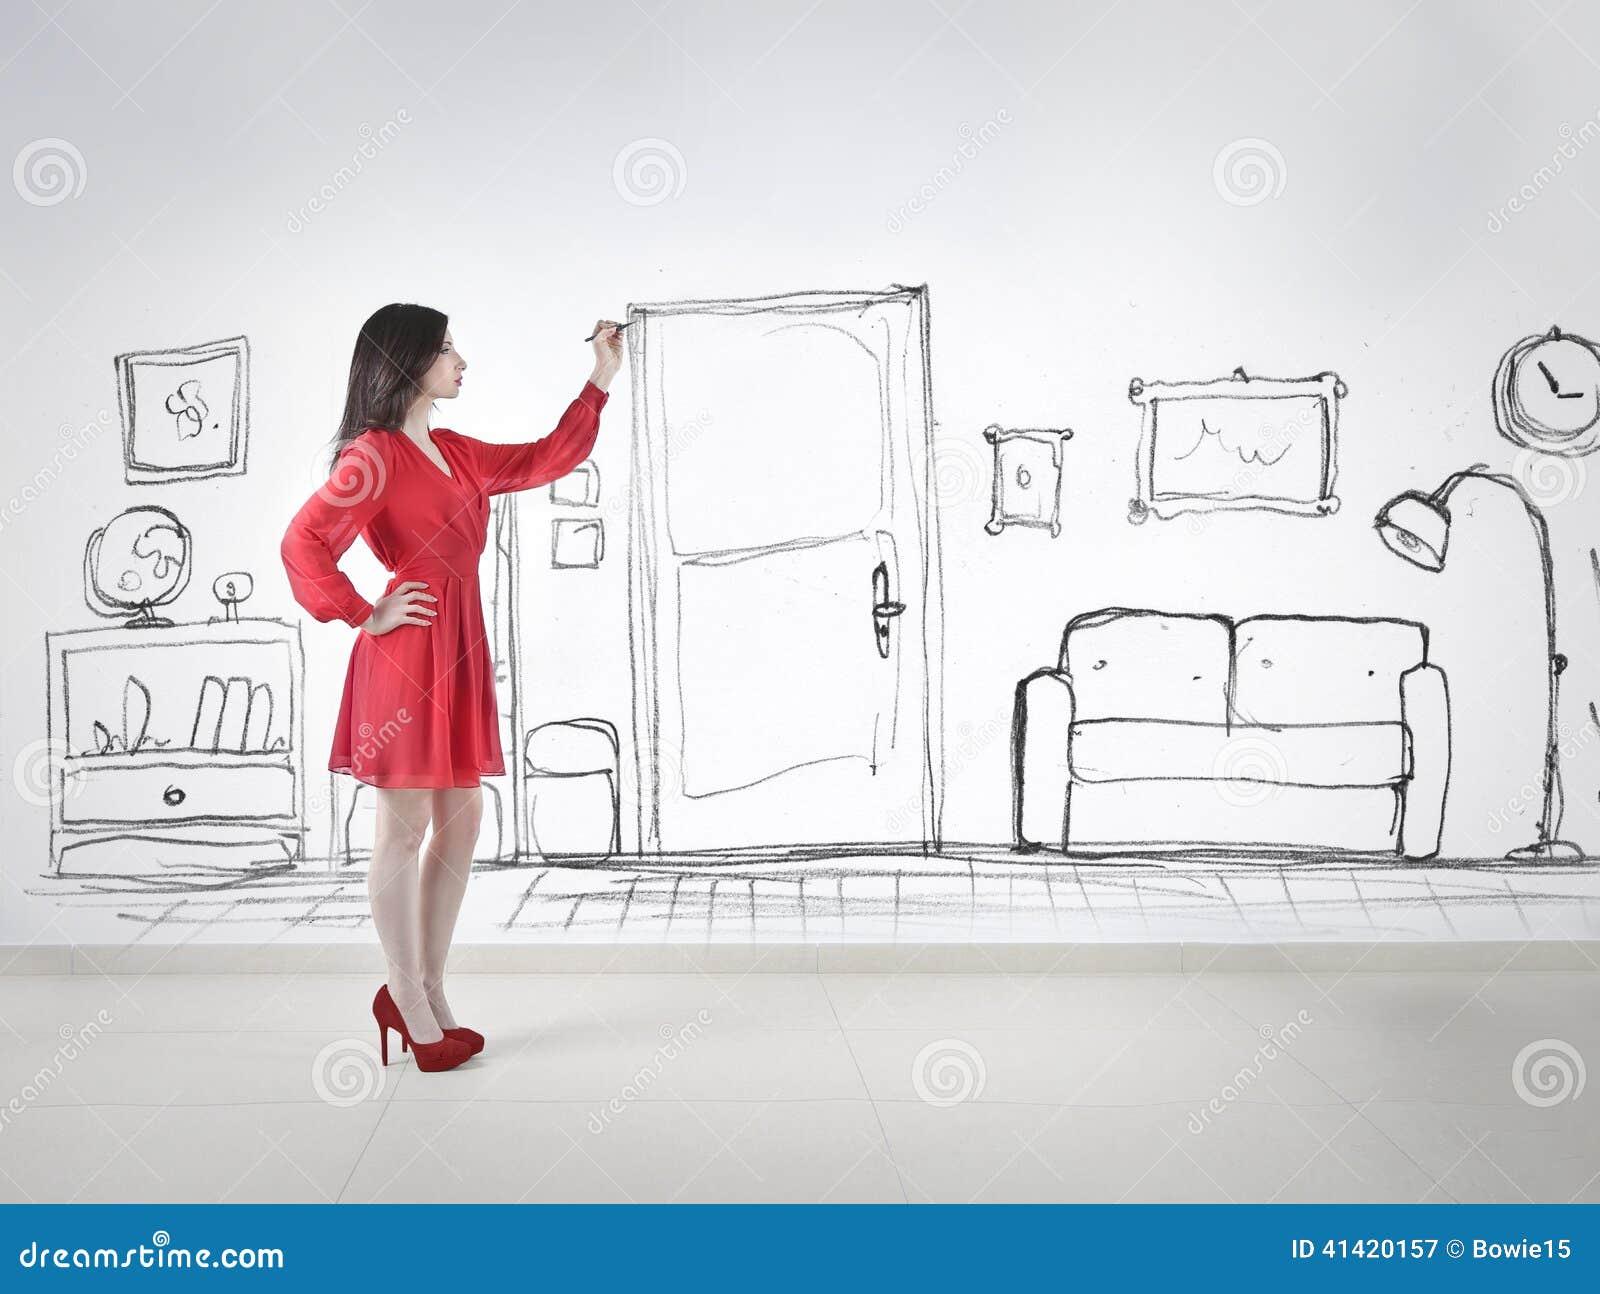 Dibujo de un cuarto